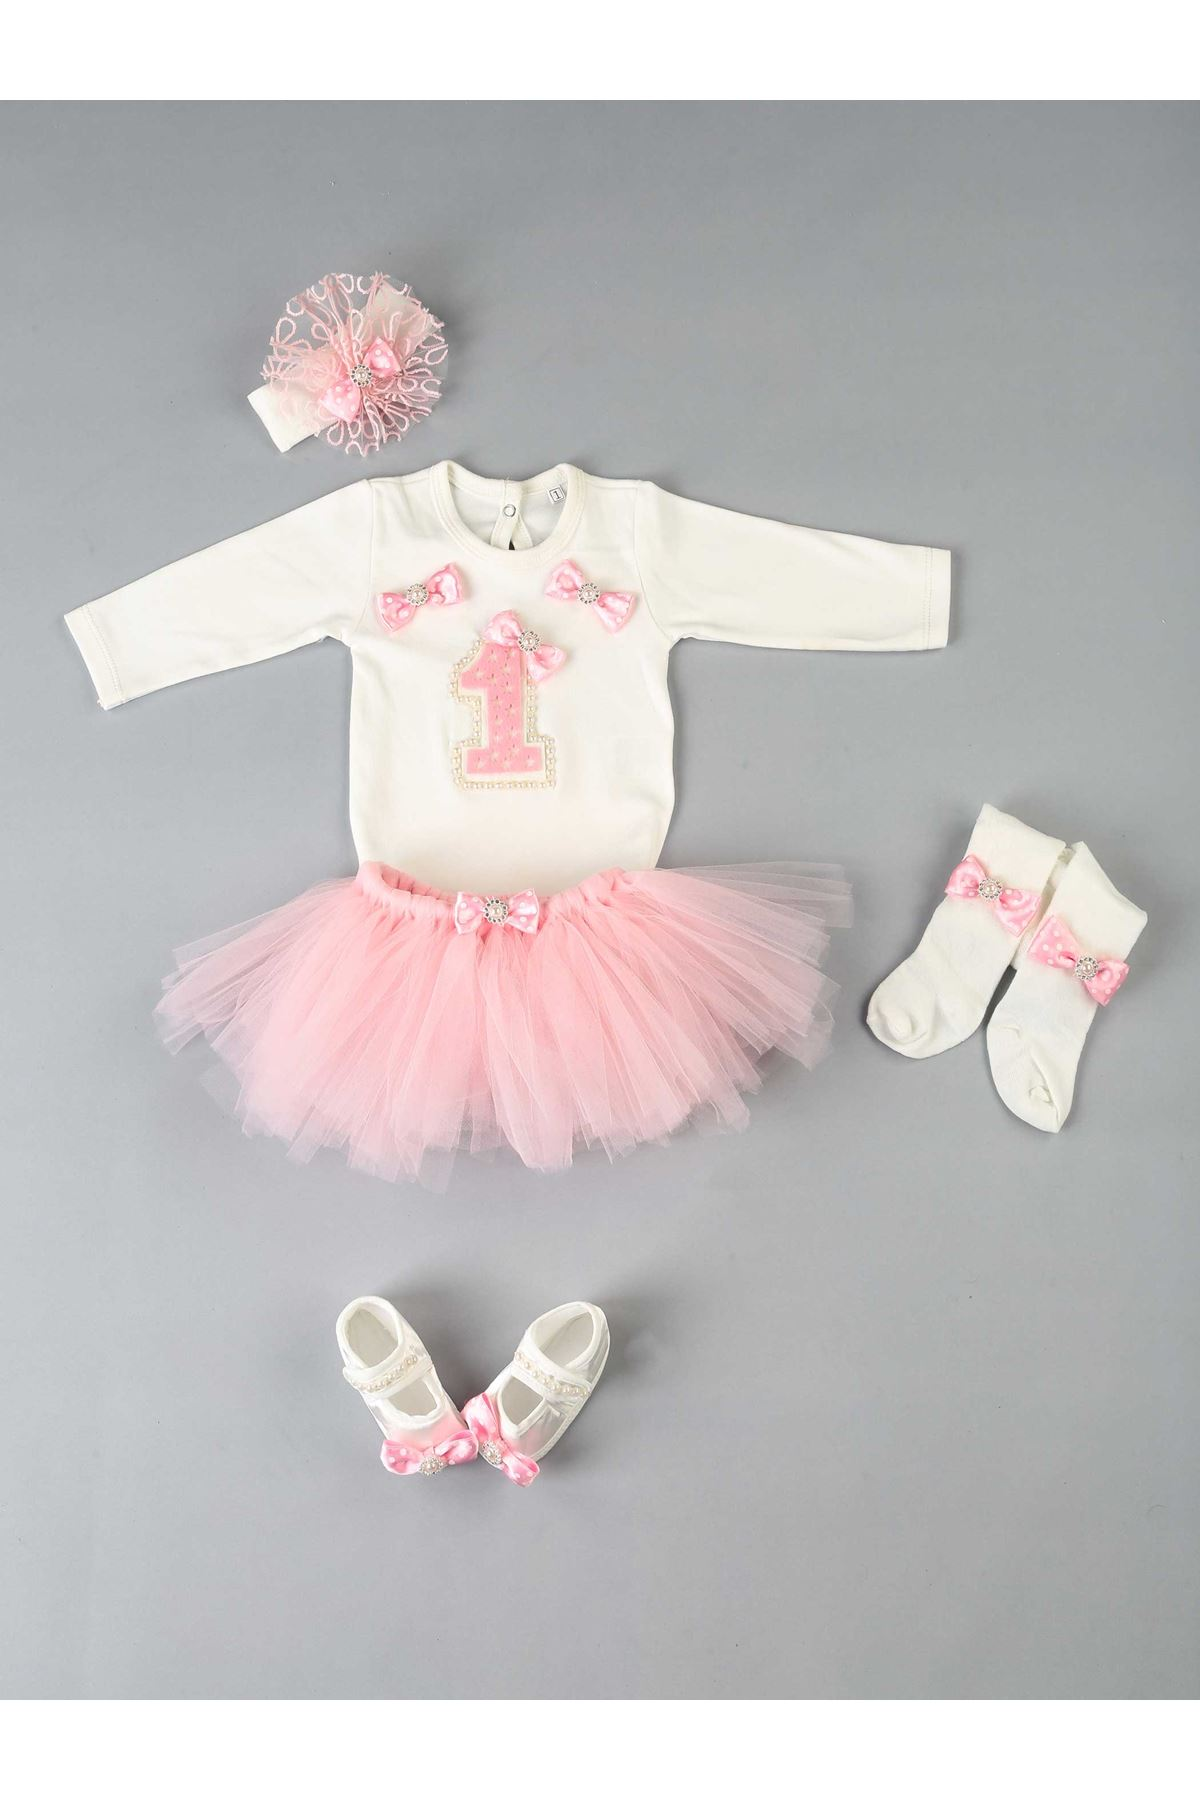 Pink 1 Years Old Baby Girl Tütü Suit